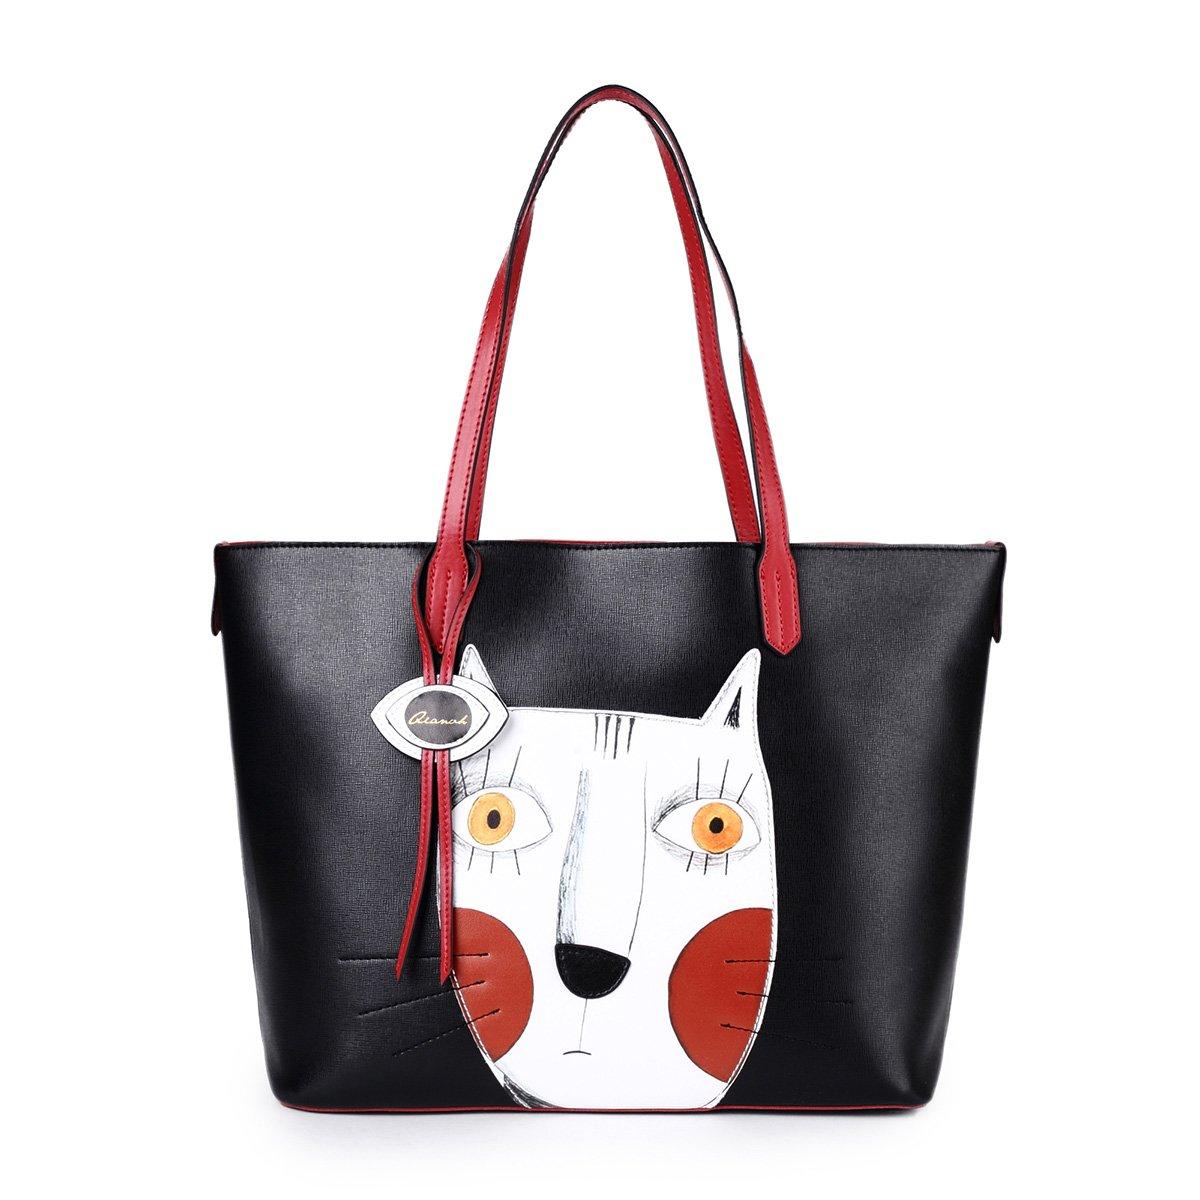 Cat Handbags for Women Leather Crossbody Cute Tote Designer Shopping Purse  Large Cross Body Shoulder Ladies Bag Black  Amazon.co.uk  Luggage 66df2aab640bb